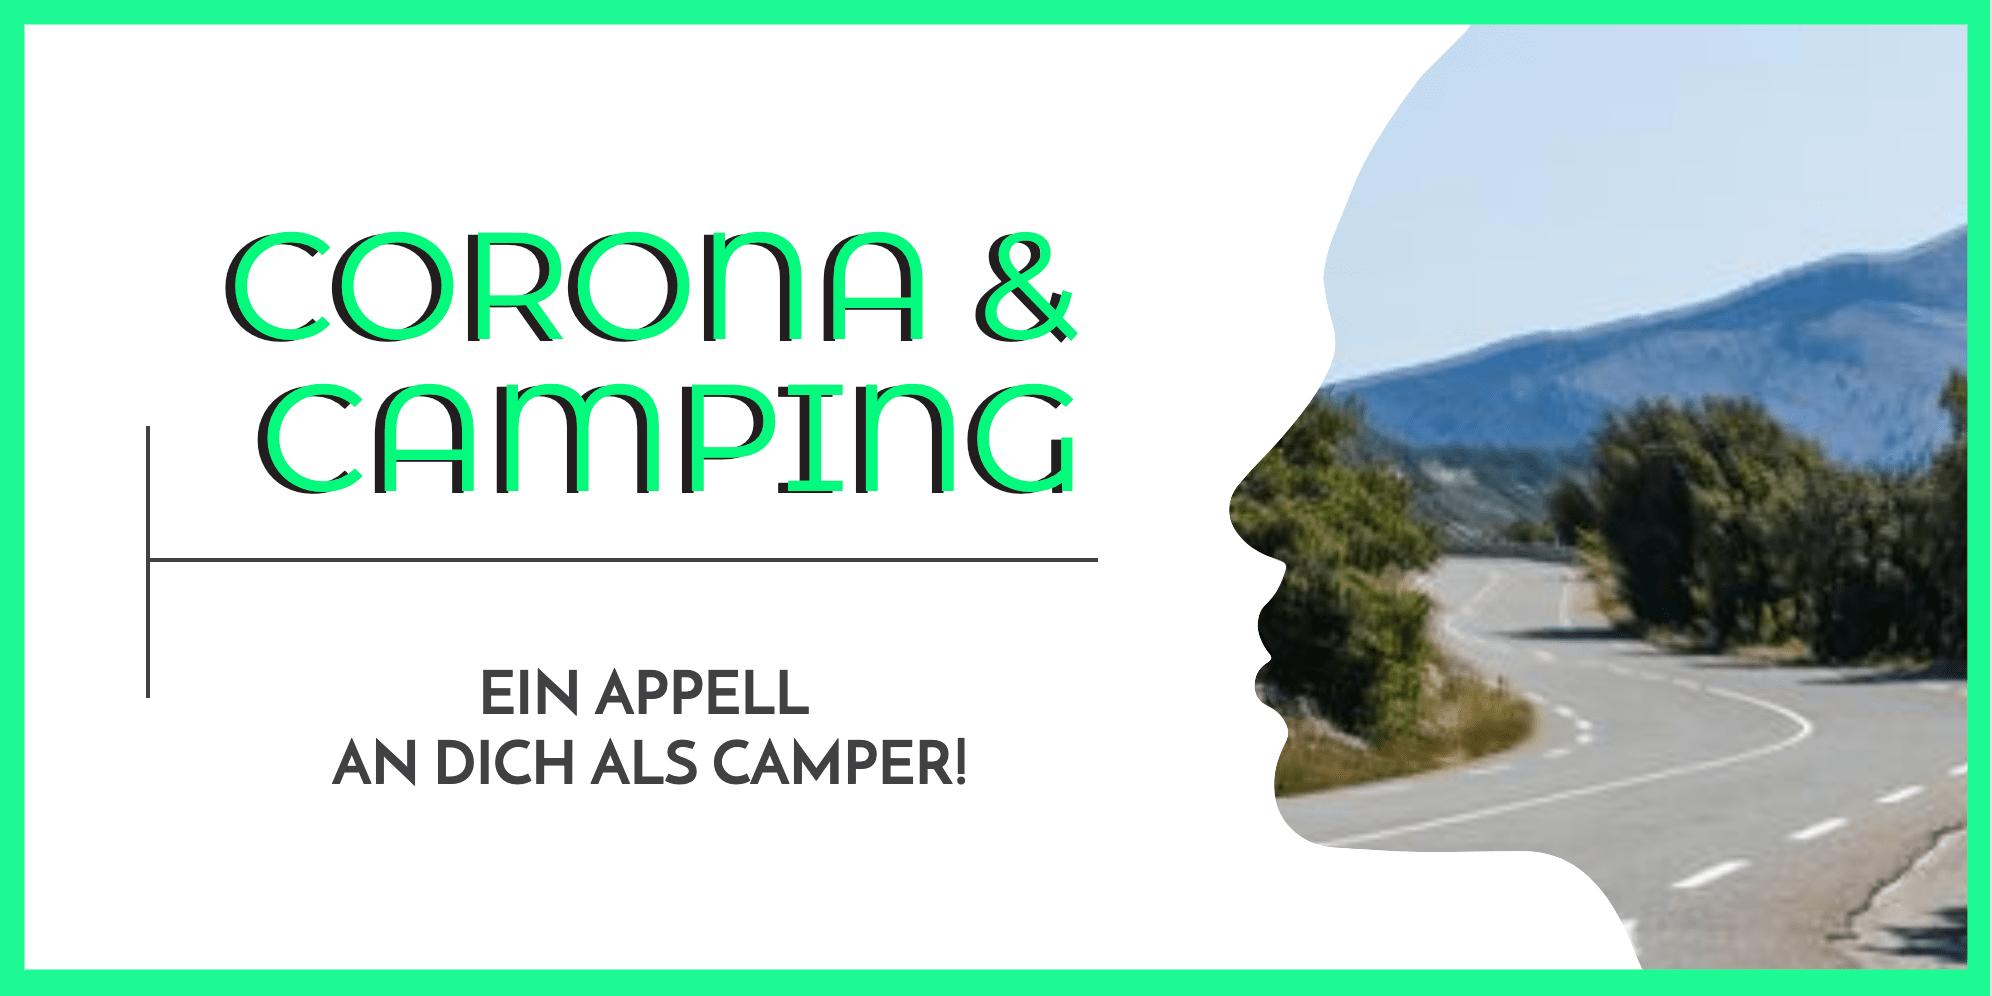 Corona und Camping ein Appell an alle Camper